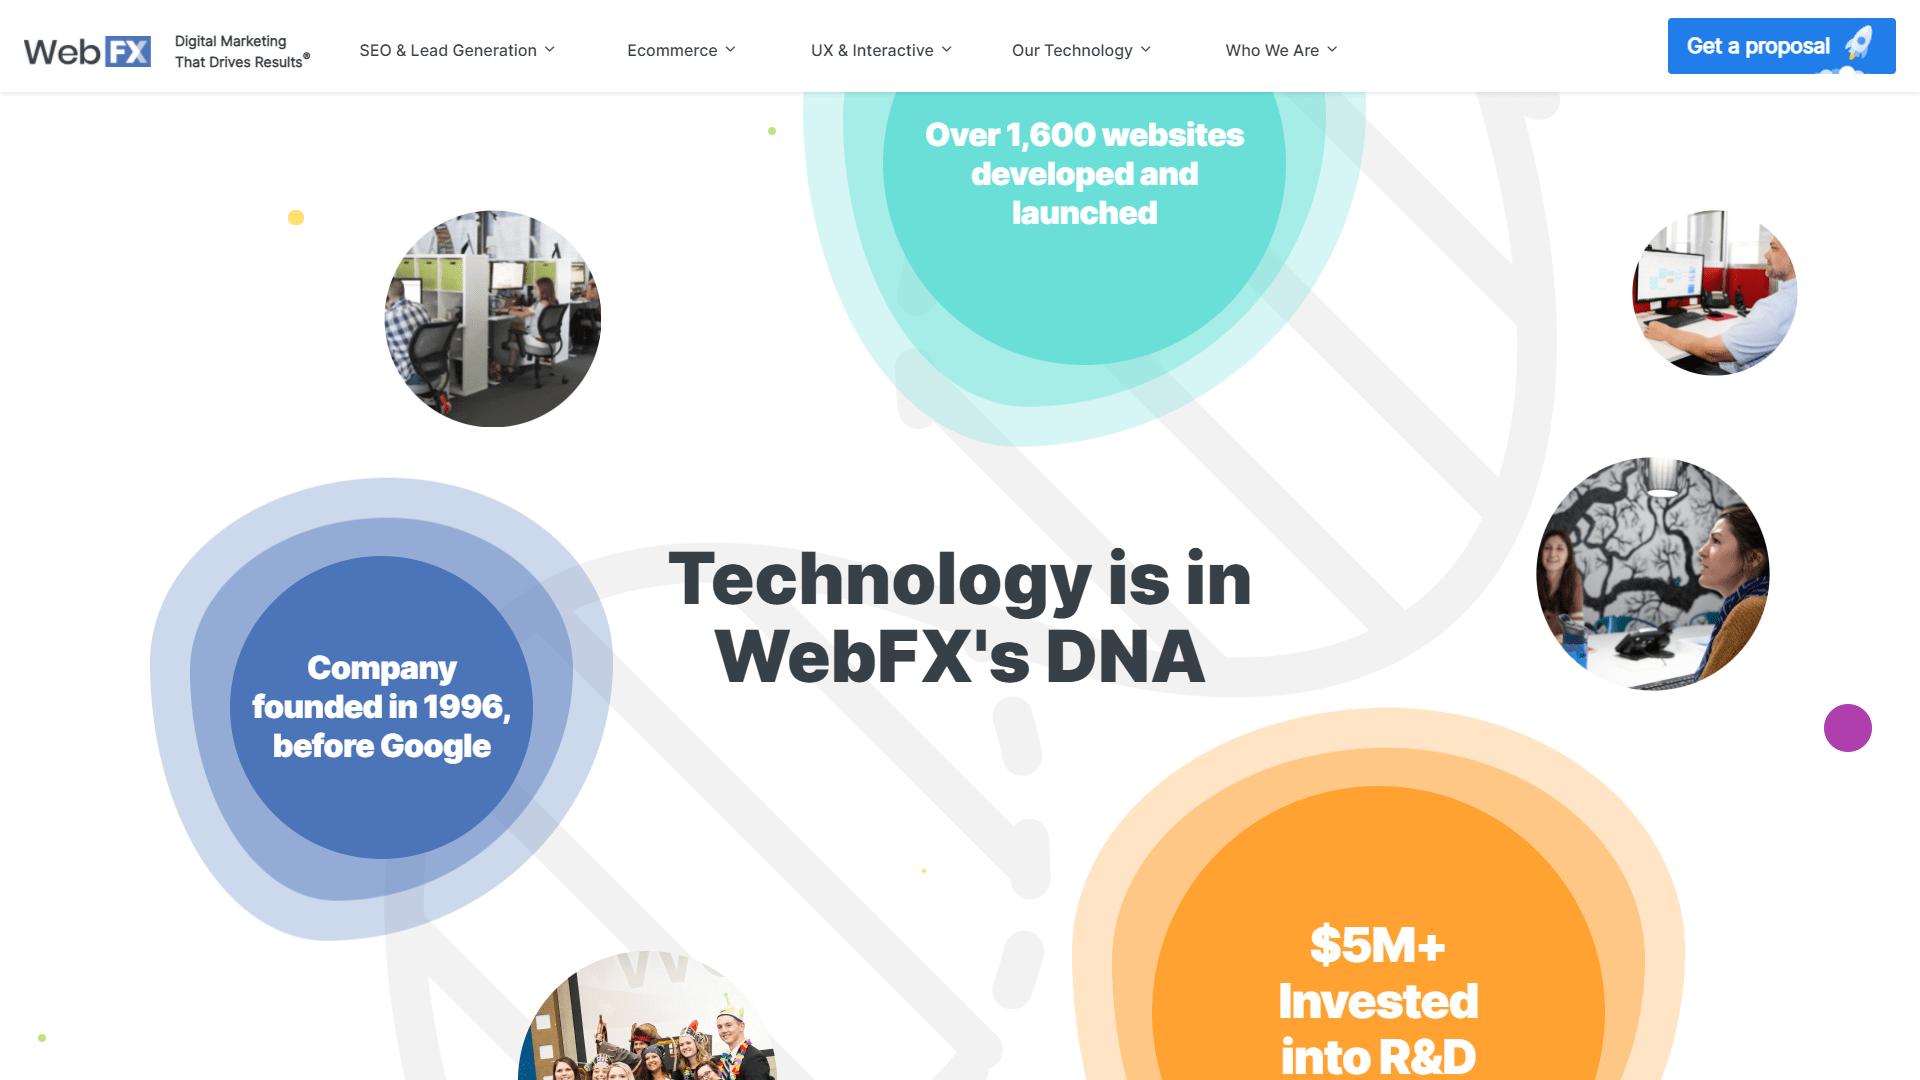 MarketingCloudFX – Marketing automation software by WebFX5